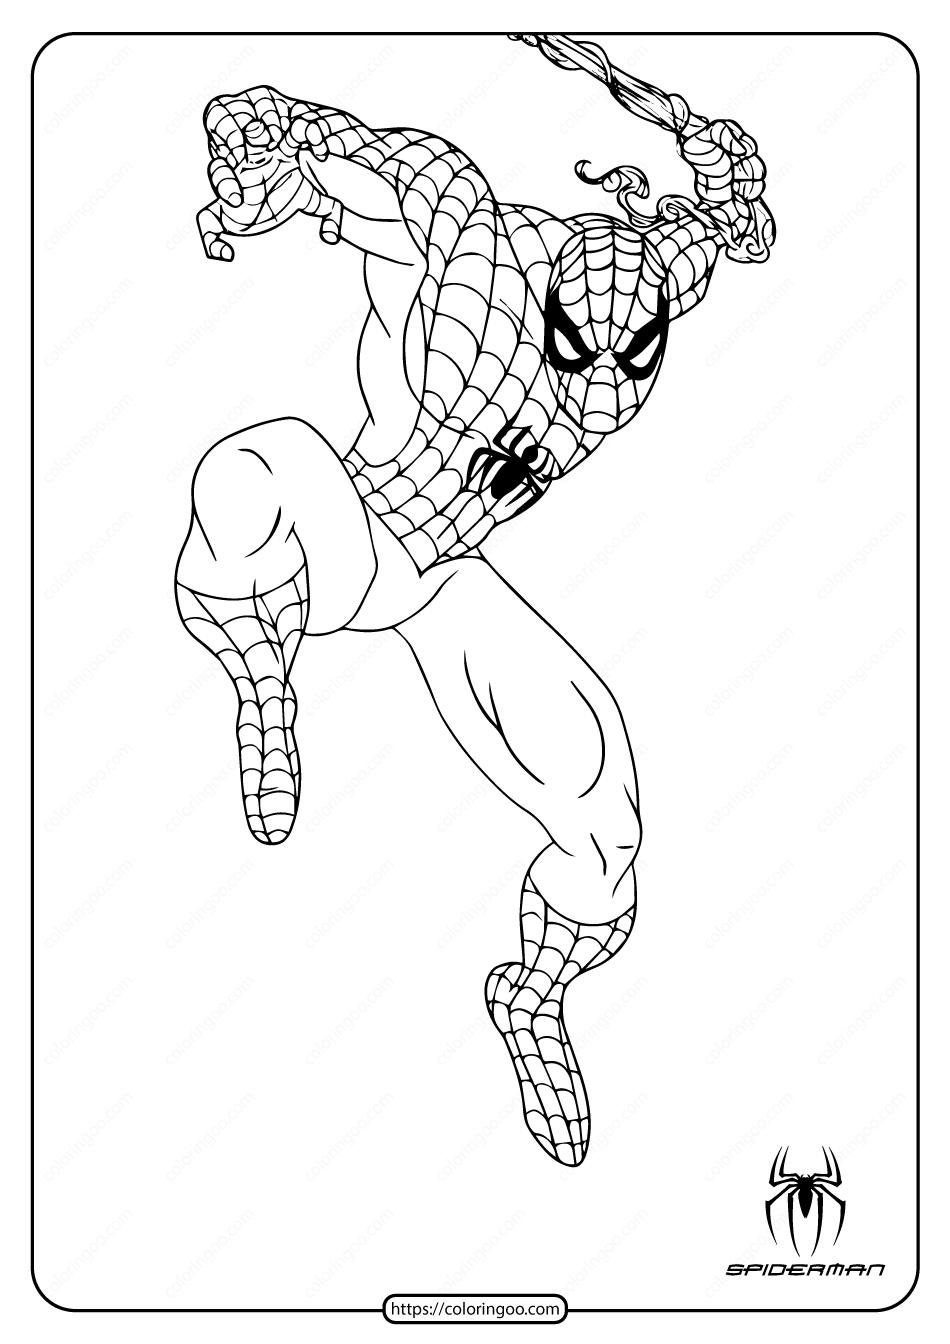 Printable Marvel Spiderman Coloring Page Spiderman Coloring Marvel Spiderman Spiderman